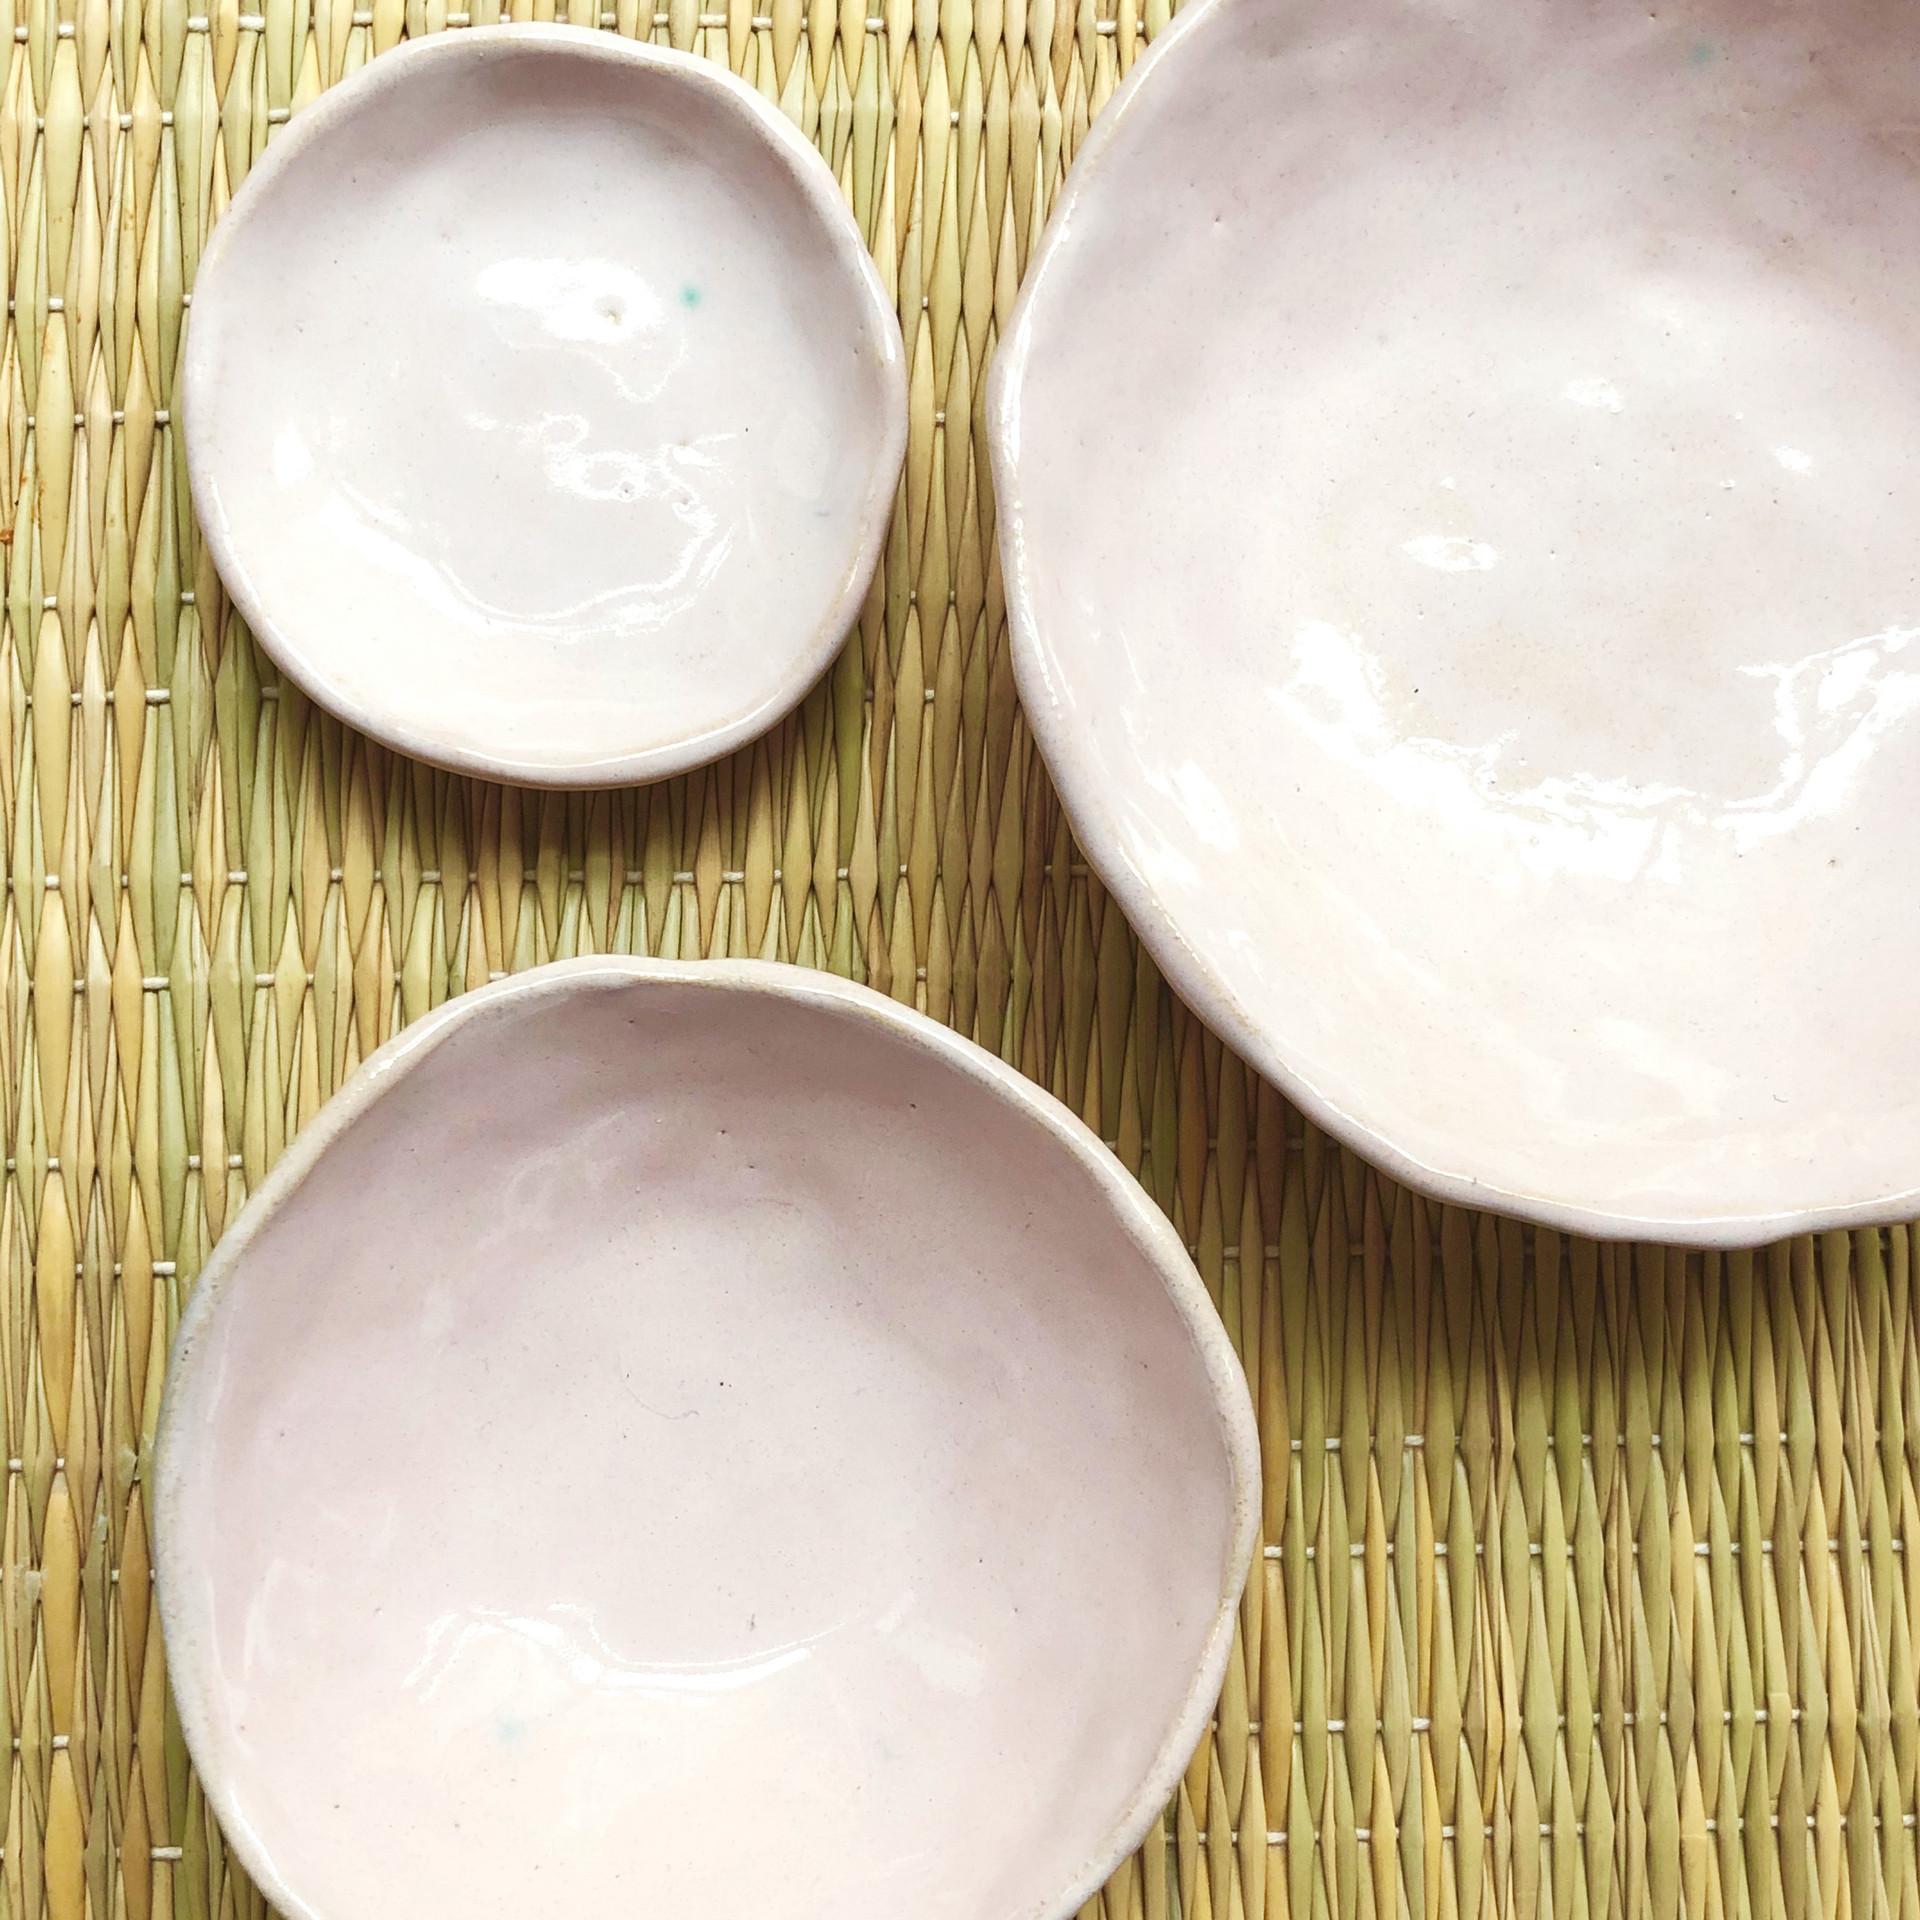 Joelle Wehkamp Handshaped Ceramics 1